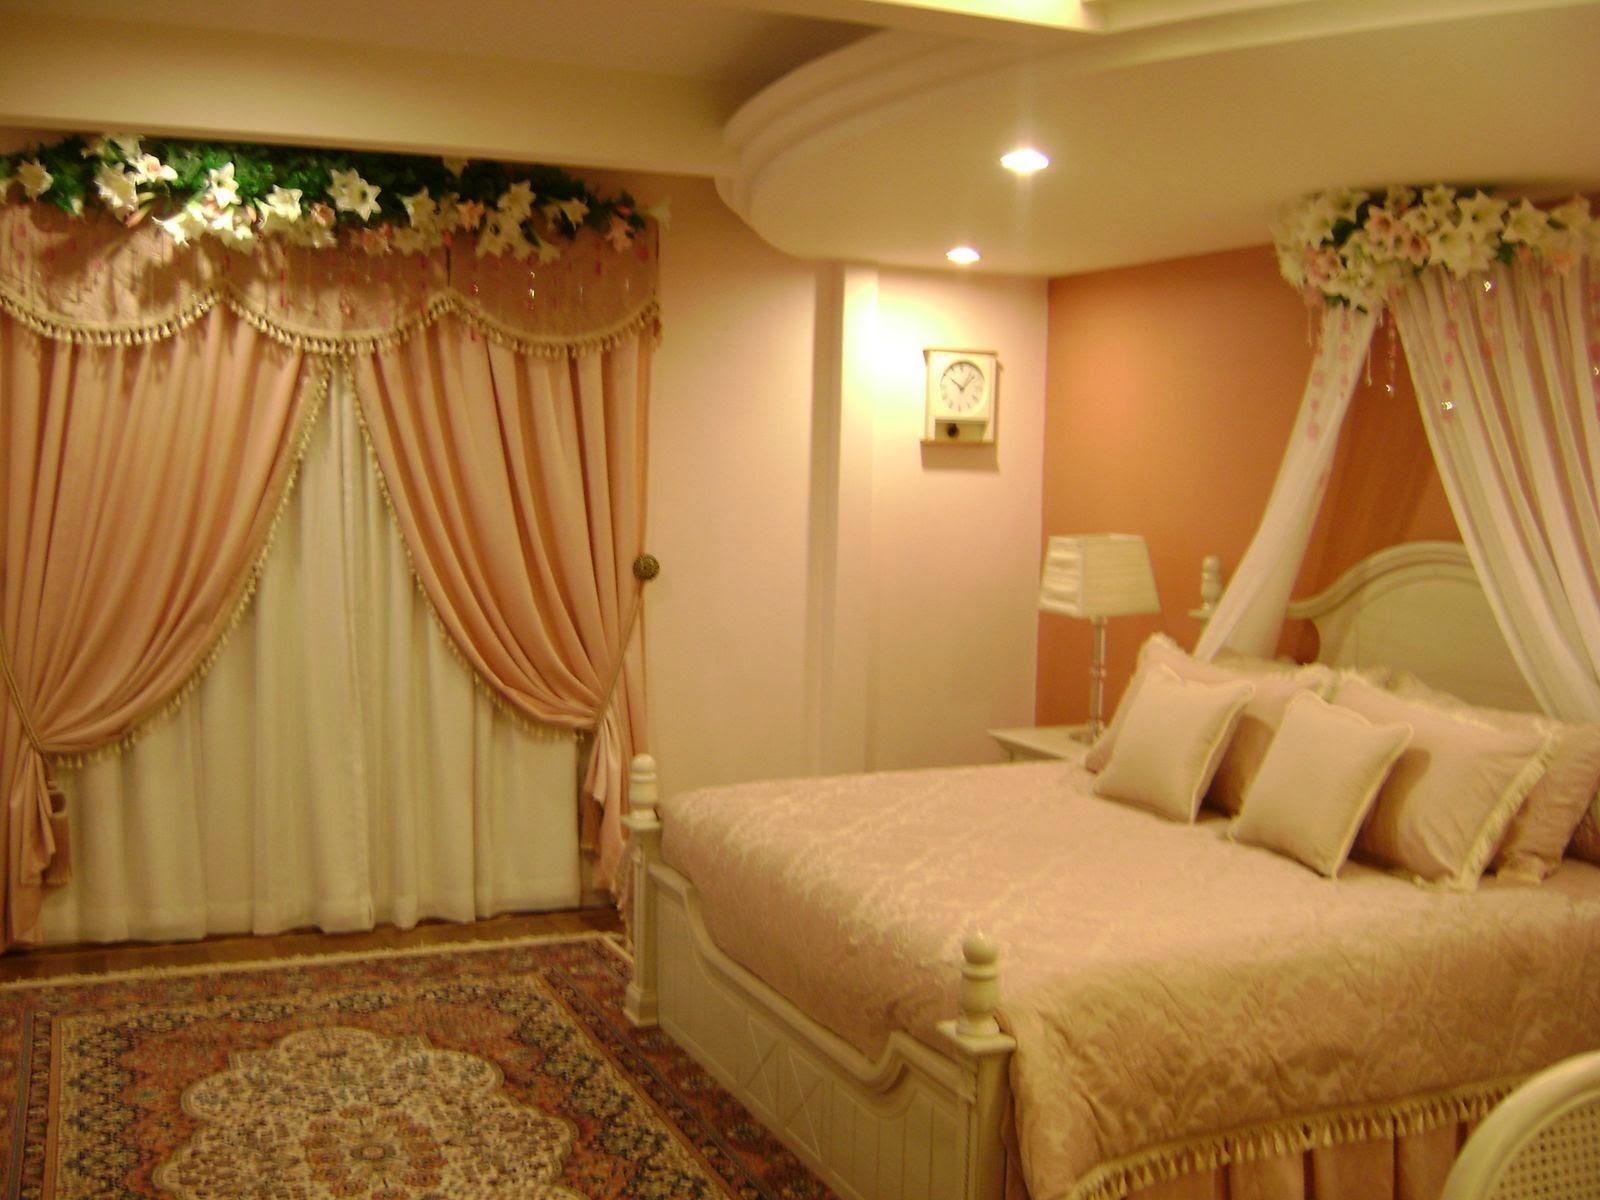 Wedding snaps october 2014 for Wedding bedroom decoration ideas